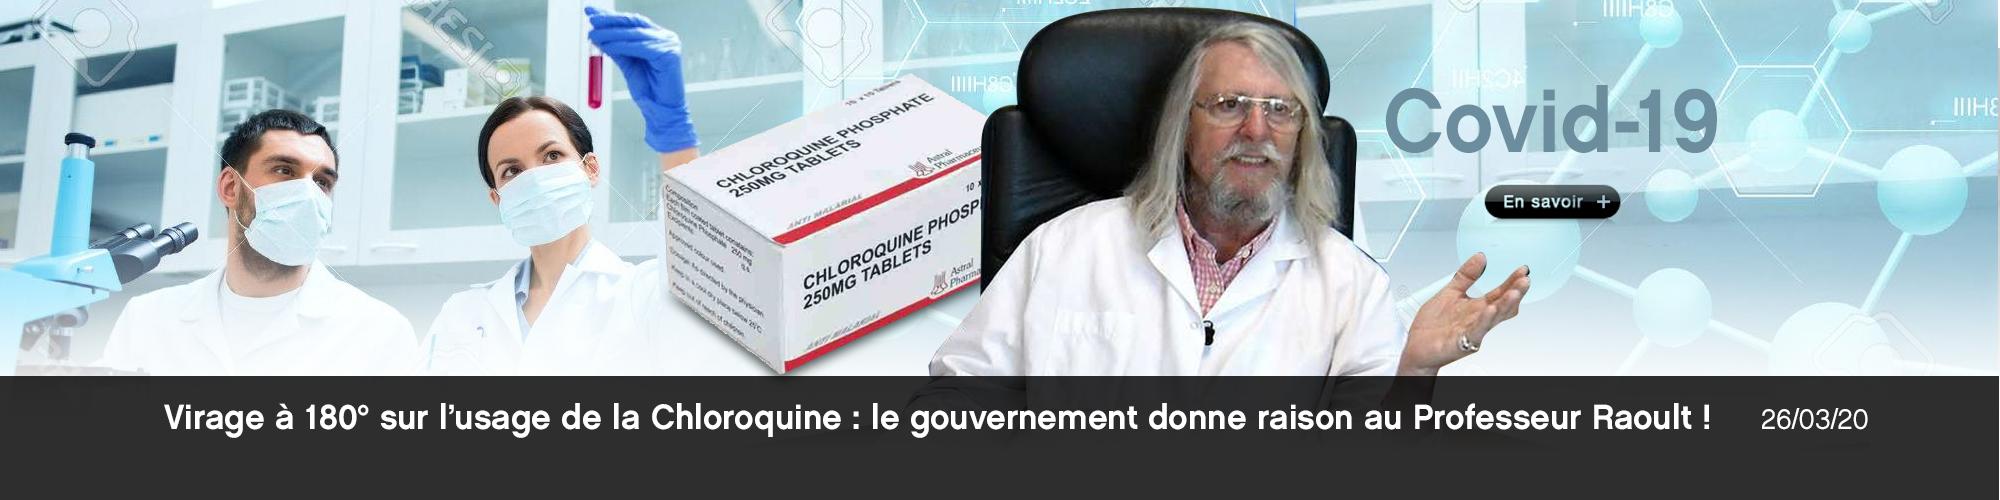 https://www.capactuel.com/storage/app/media/Carousel/accueil/covid-19.jpg